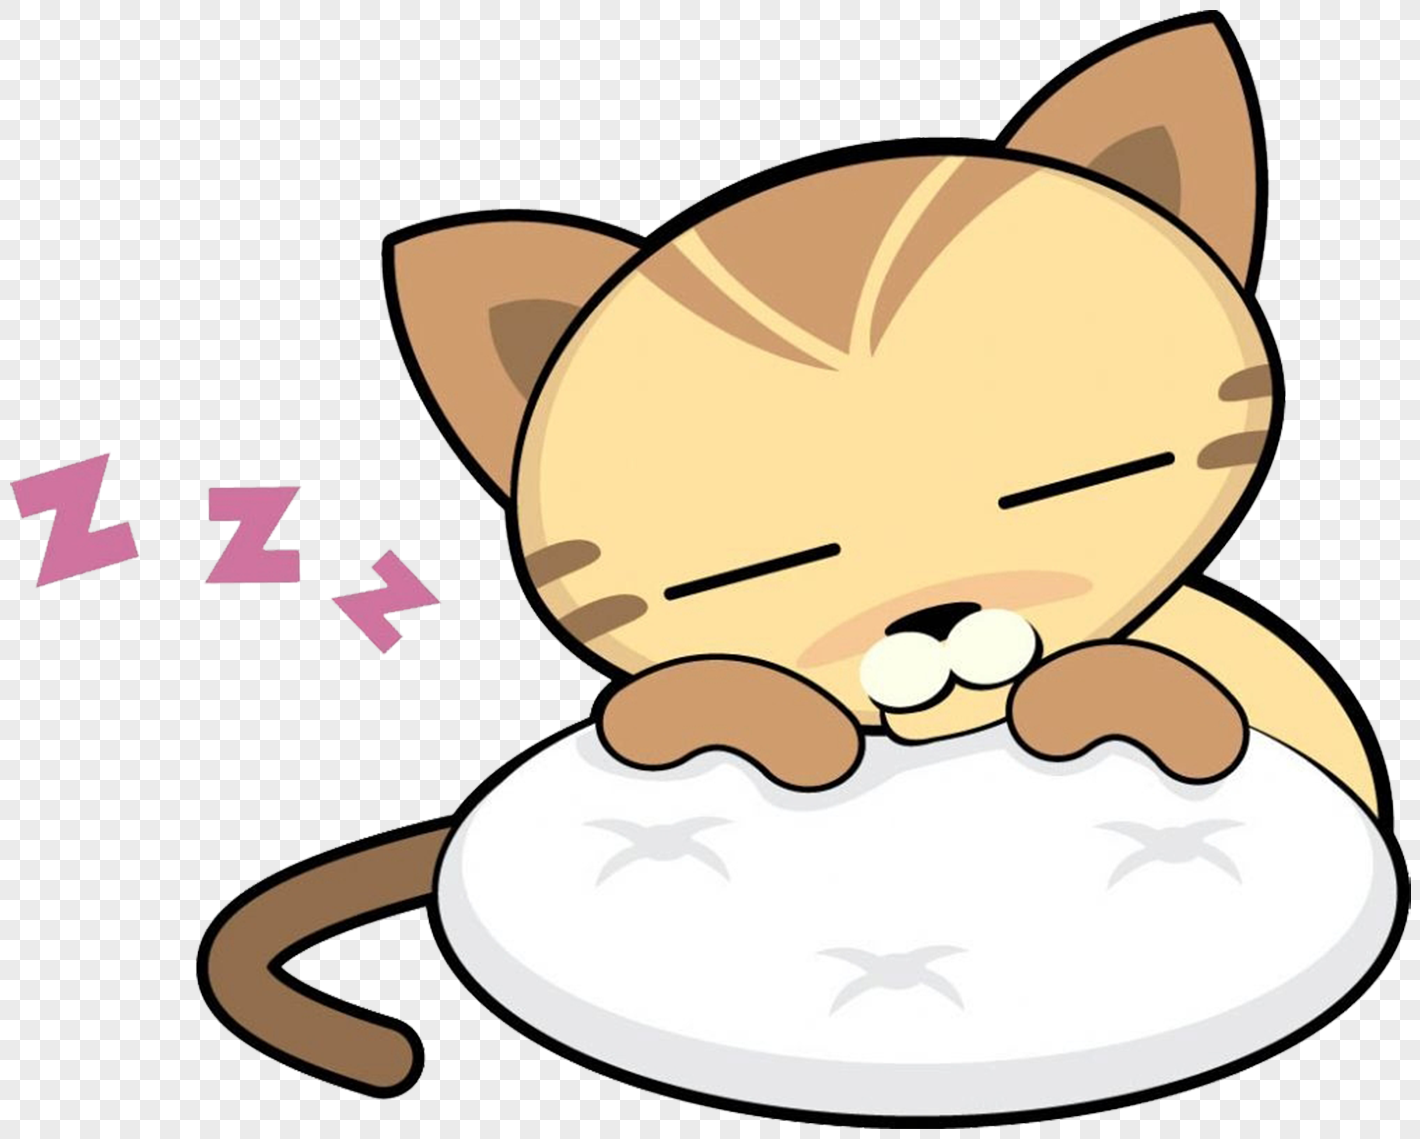 Gambar Kartun Kucing Tidur Wwwtollebildcom